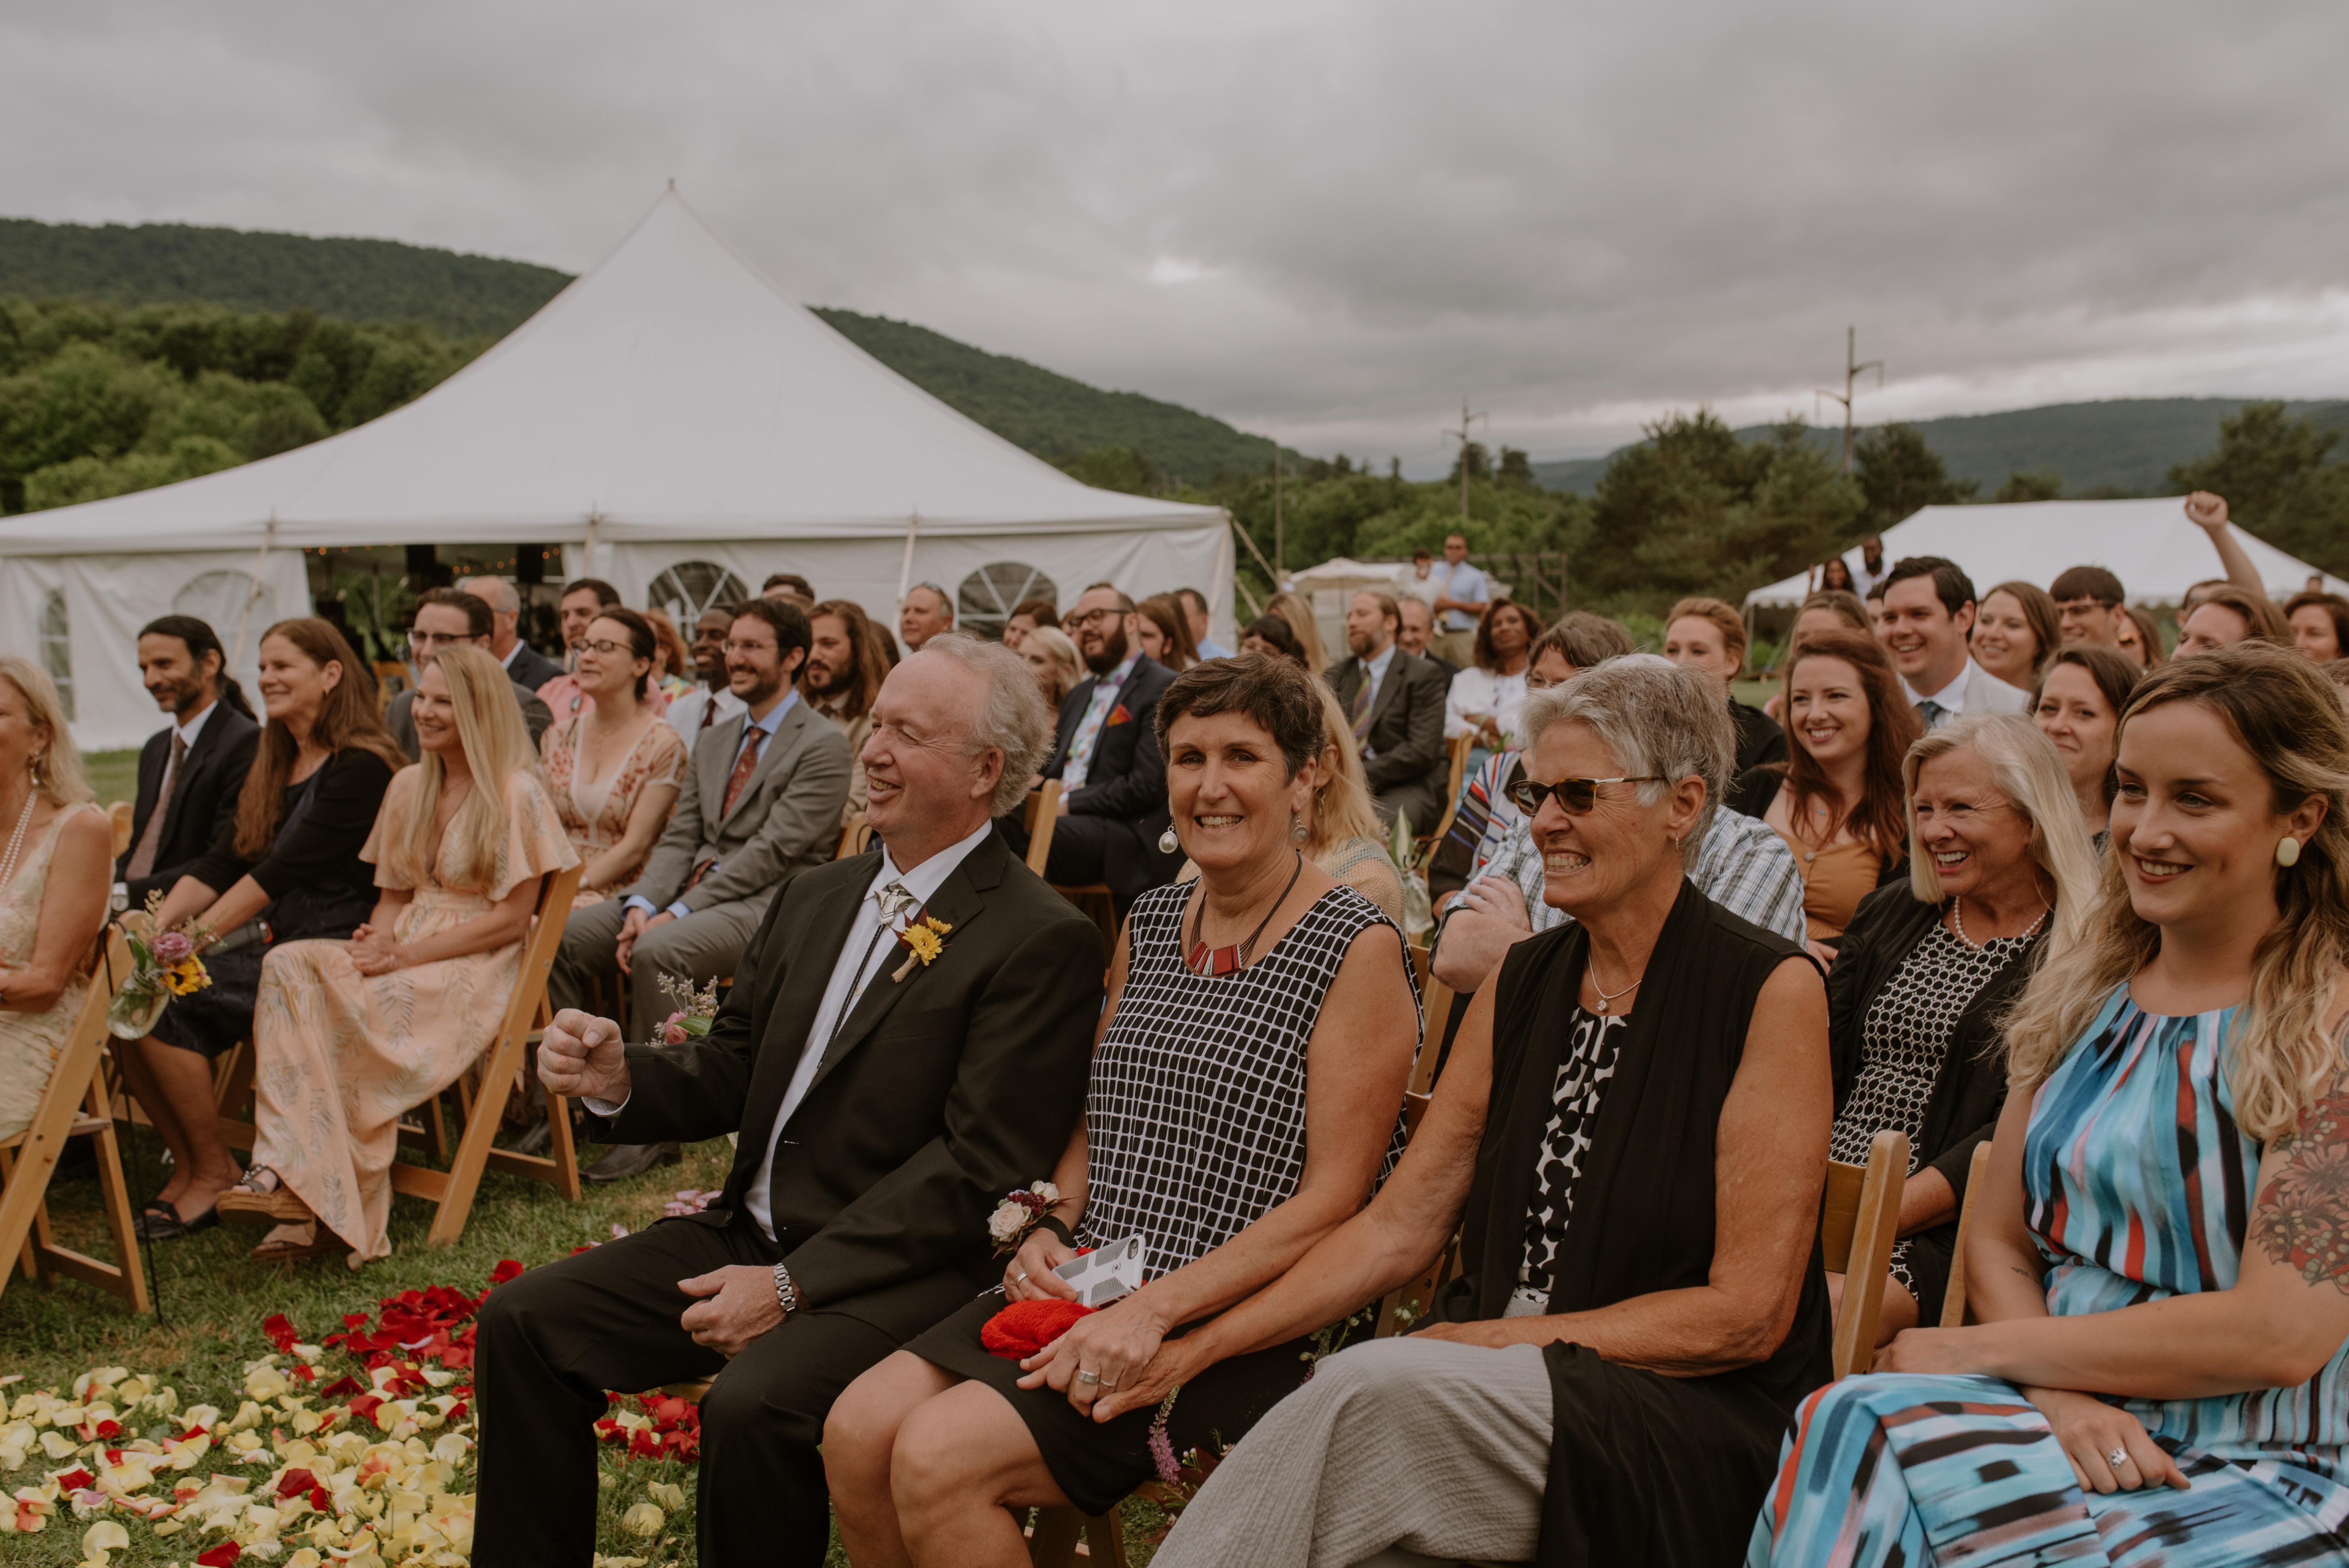 Amber-Alex-Wedding-Upstate-Catskills-Summer-Meadowlark-Stills-Lawrence-Braun--0337